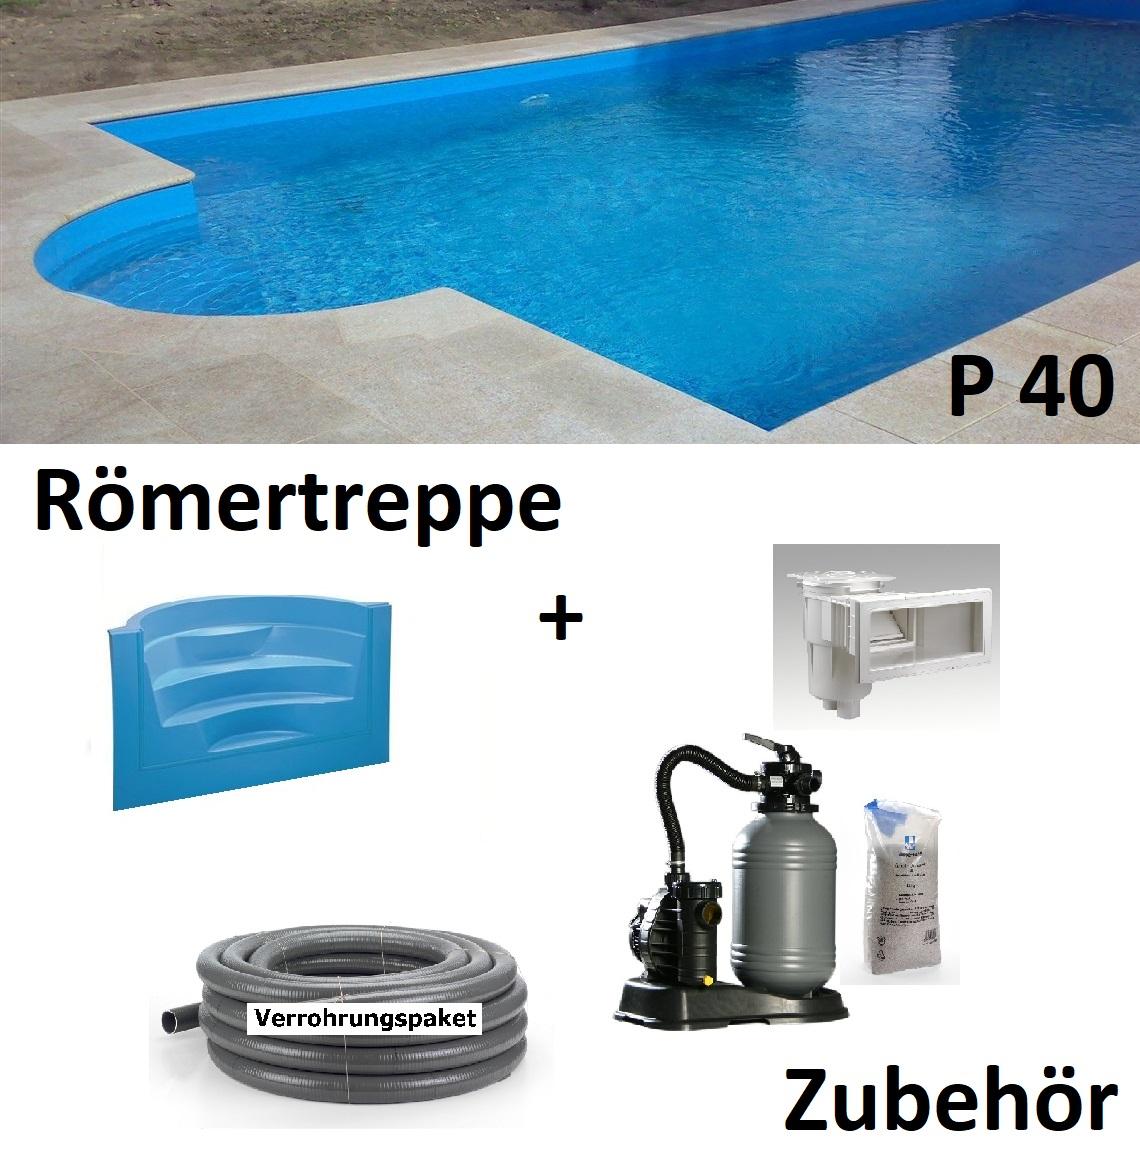 Pool Komplettset 4x8x1,50 m 0,8 mm Folie Styropor Becken  P40 Swimmingpool